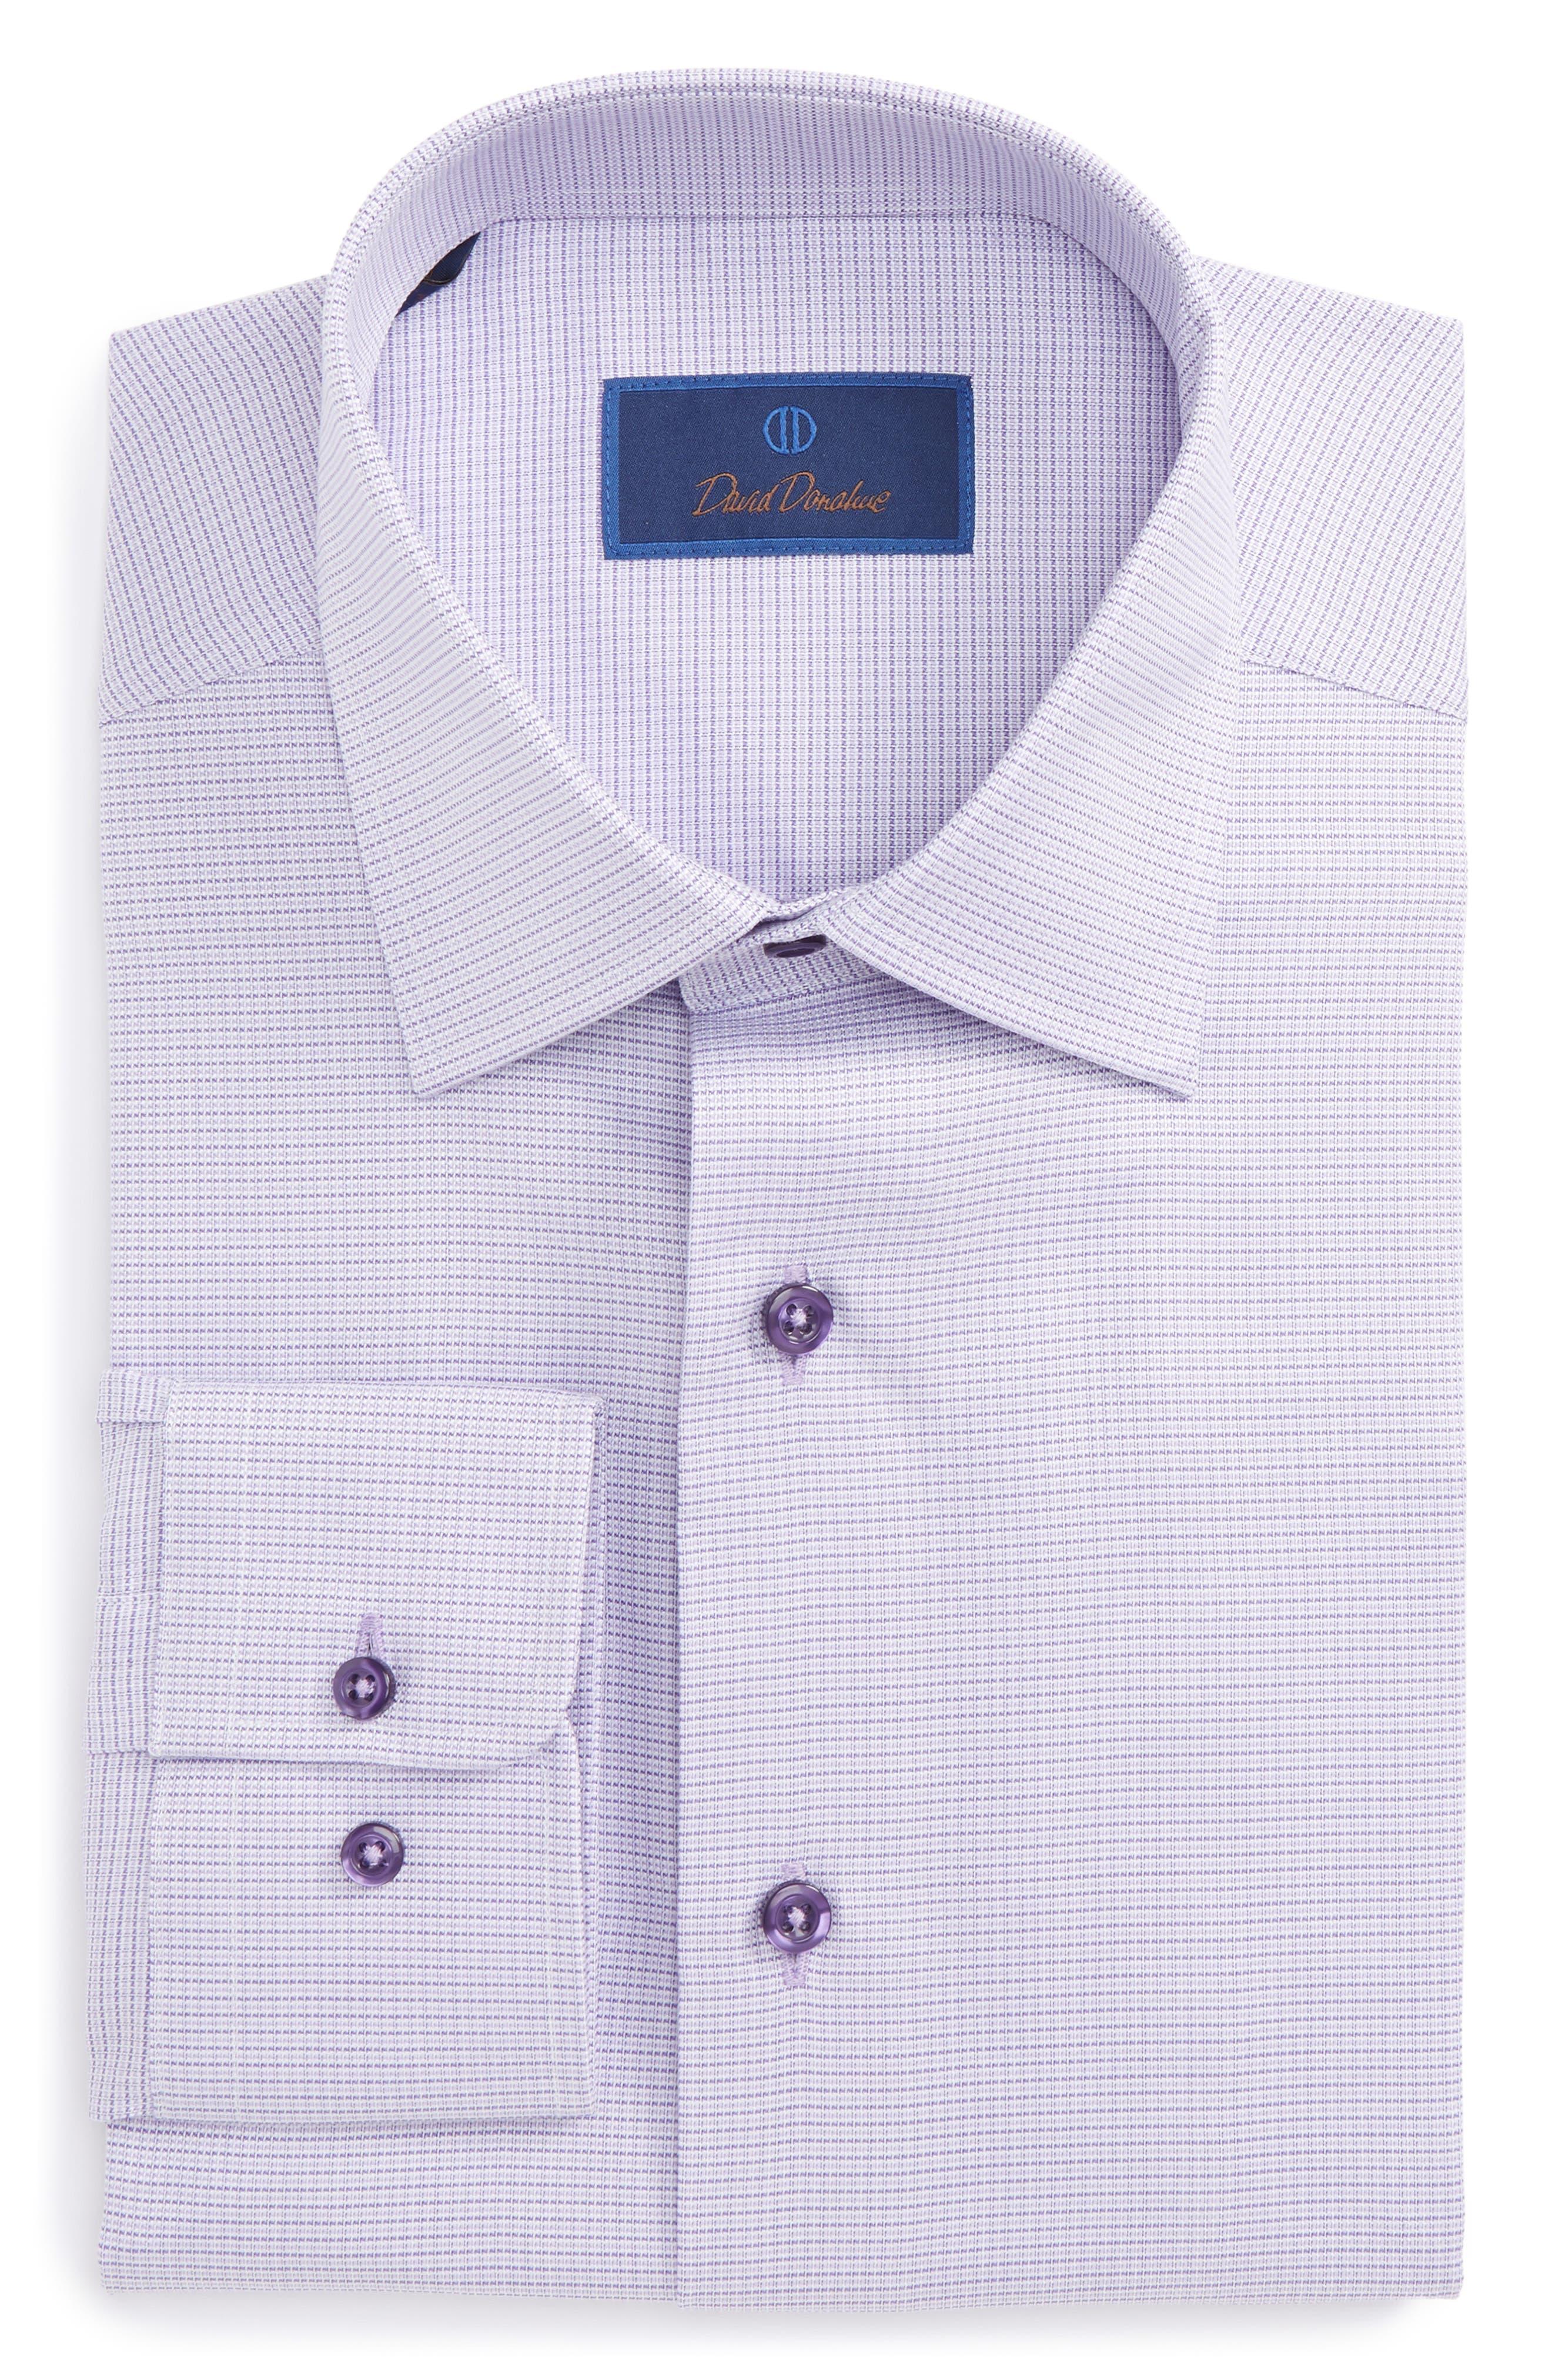 Regular Fit Solid Dress Shirt,                         Main,                         color, Lilac